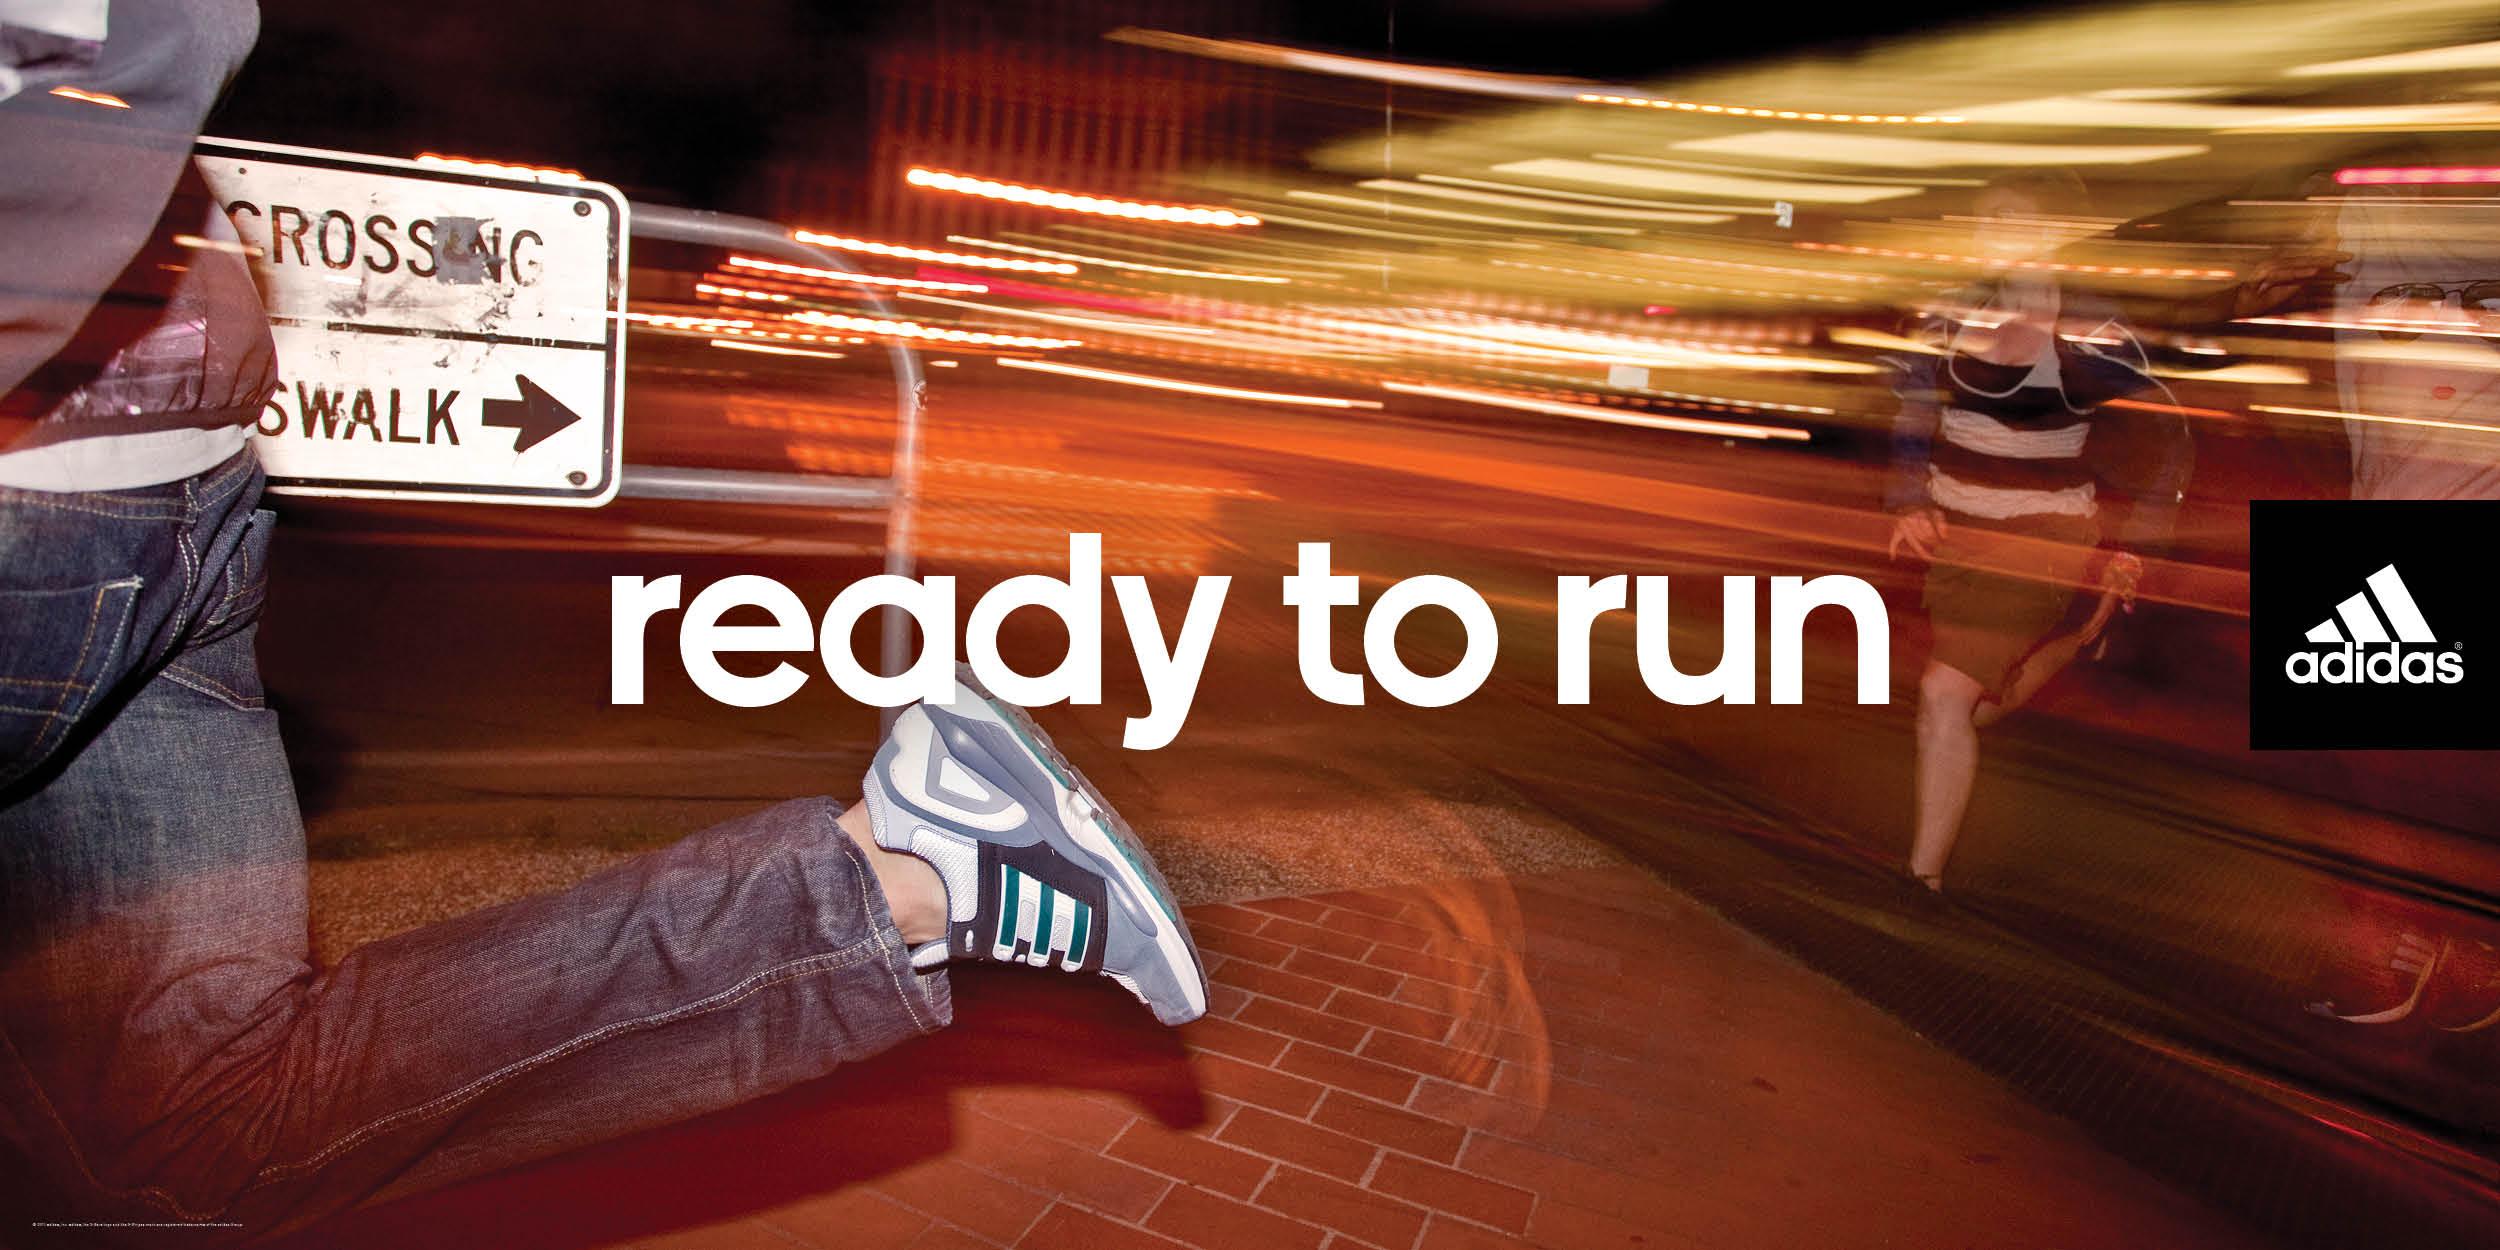 adidas Re:Run Campaign